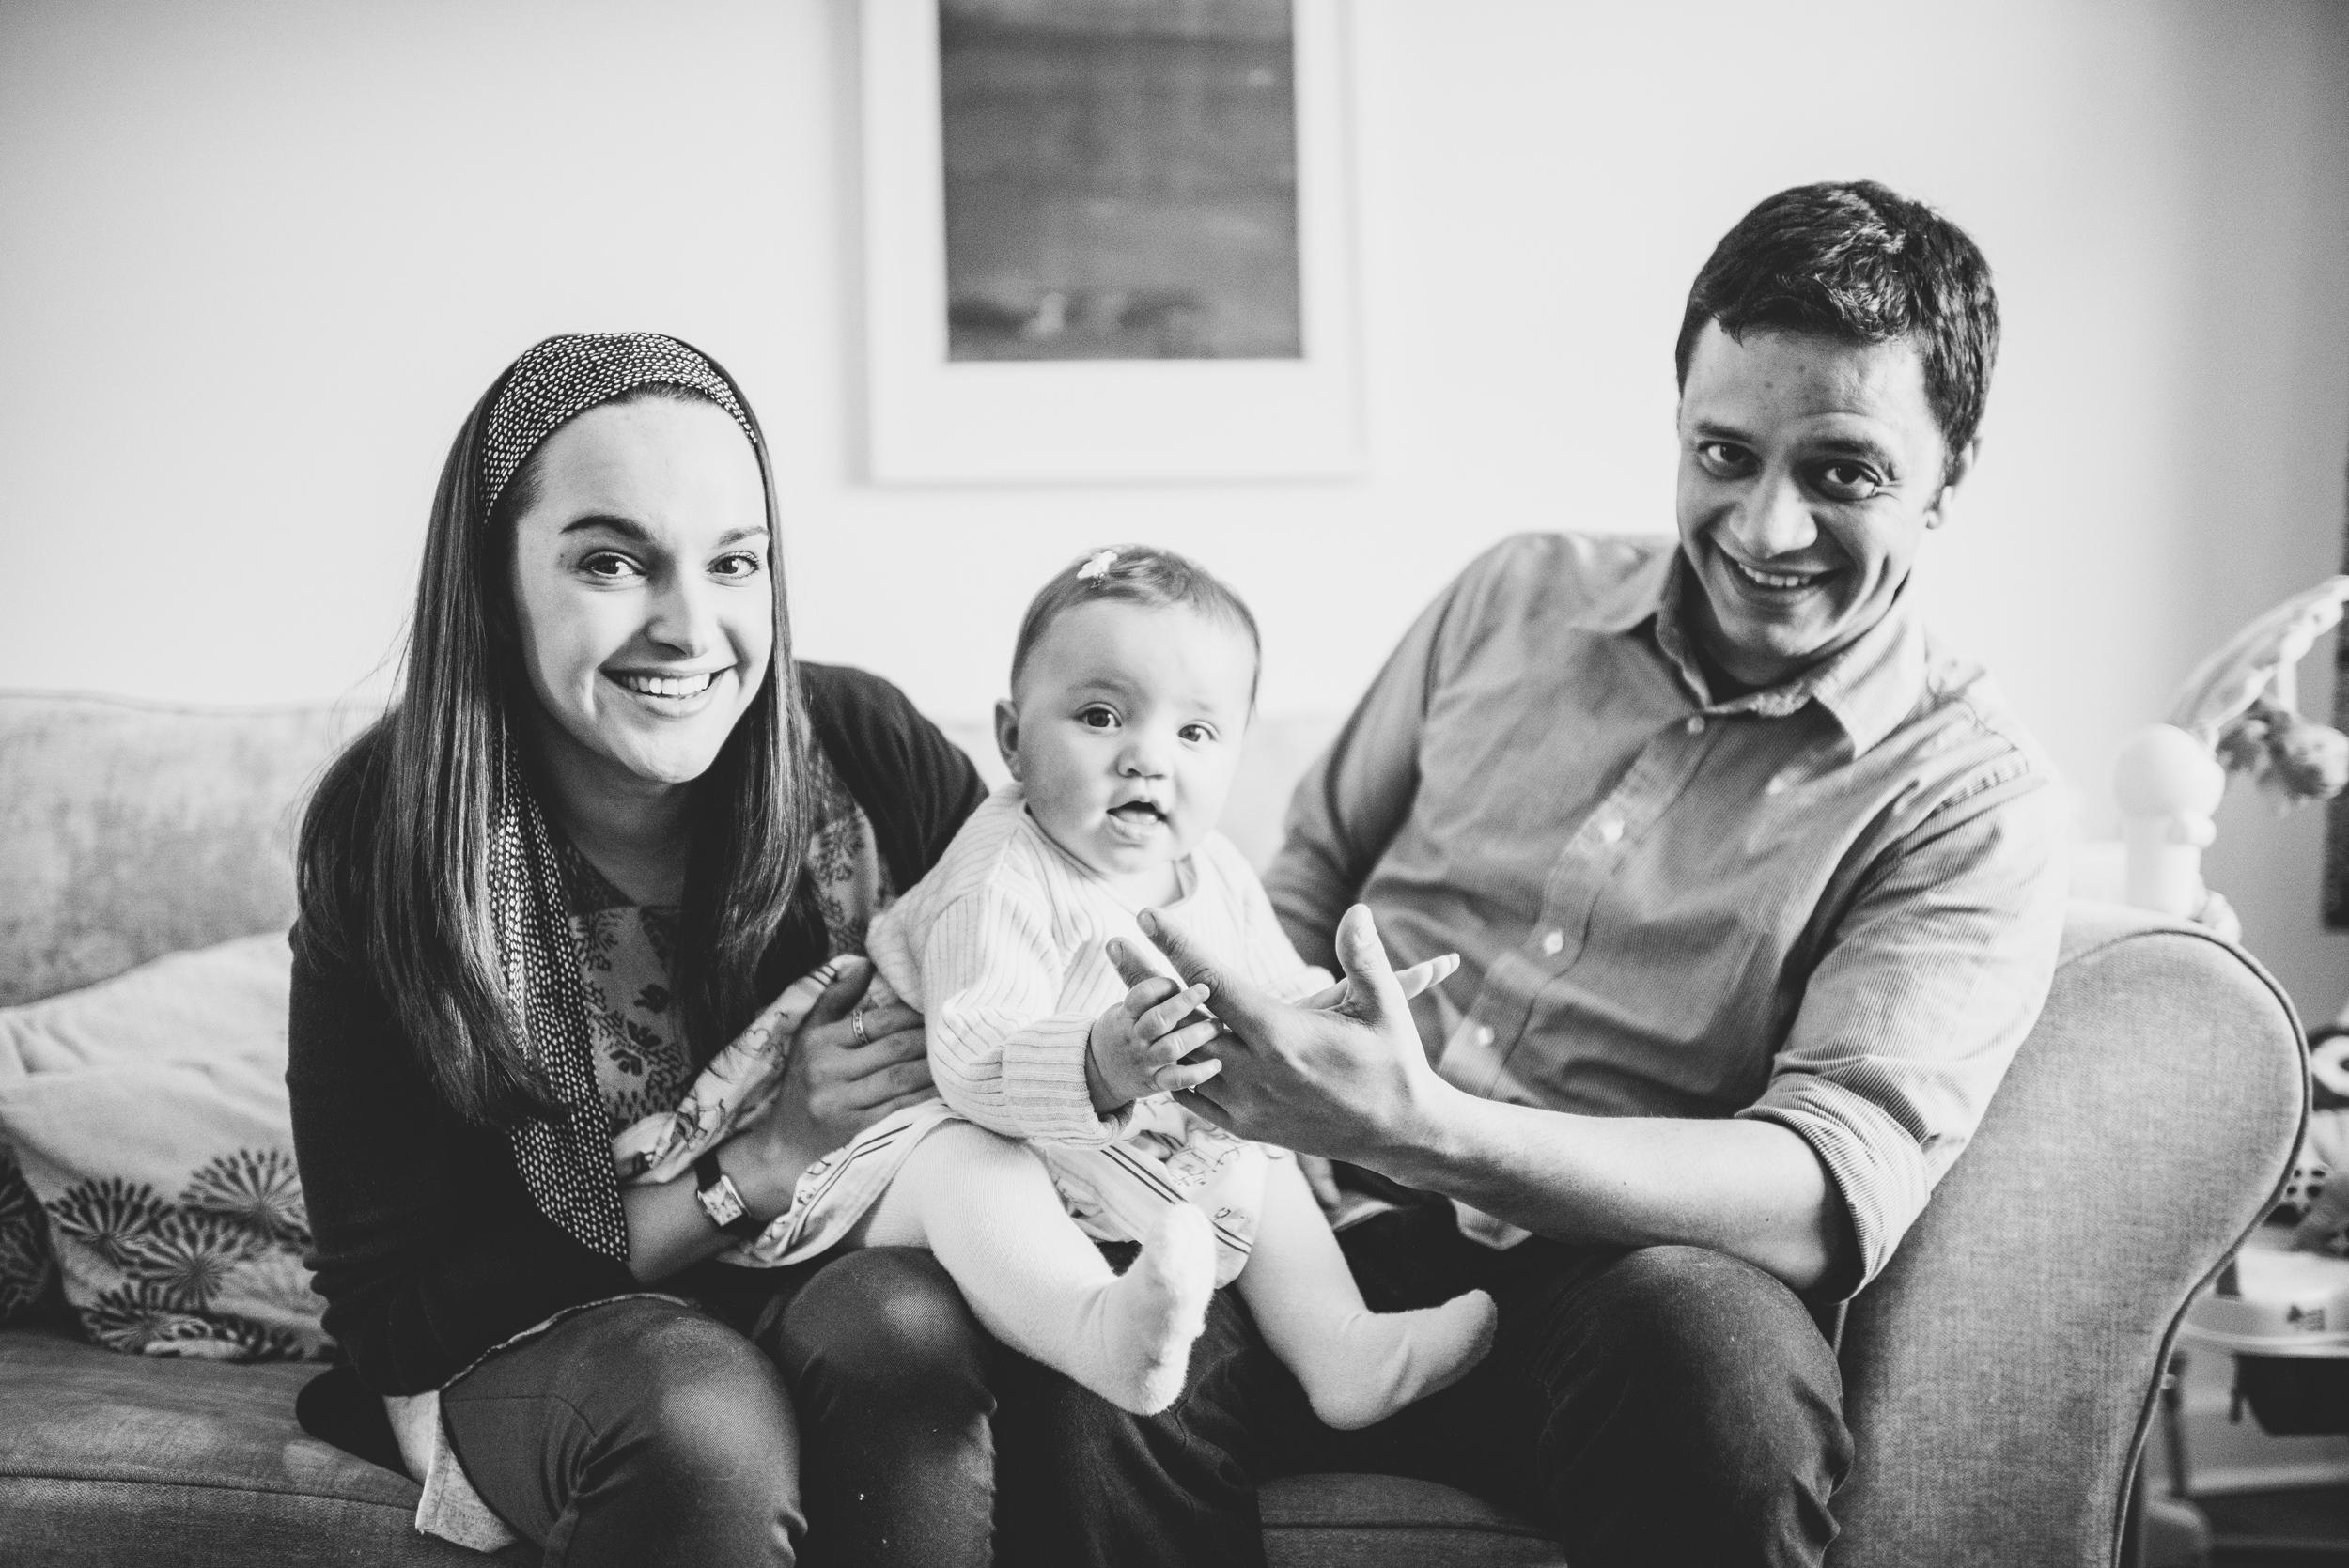 0050-ALTERNATIVE-WEDDING-PHOTOGRAPHER-GLASGOW-FAMILY-PHOTOGRAPHER-KIDS-PORTRAITS-BABY-PORTRAITS-GLASGOW.JPG